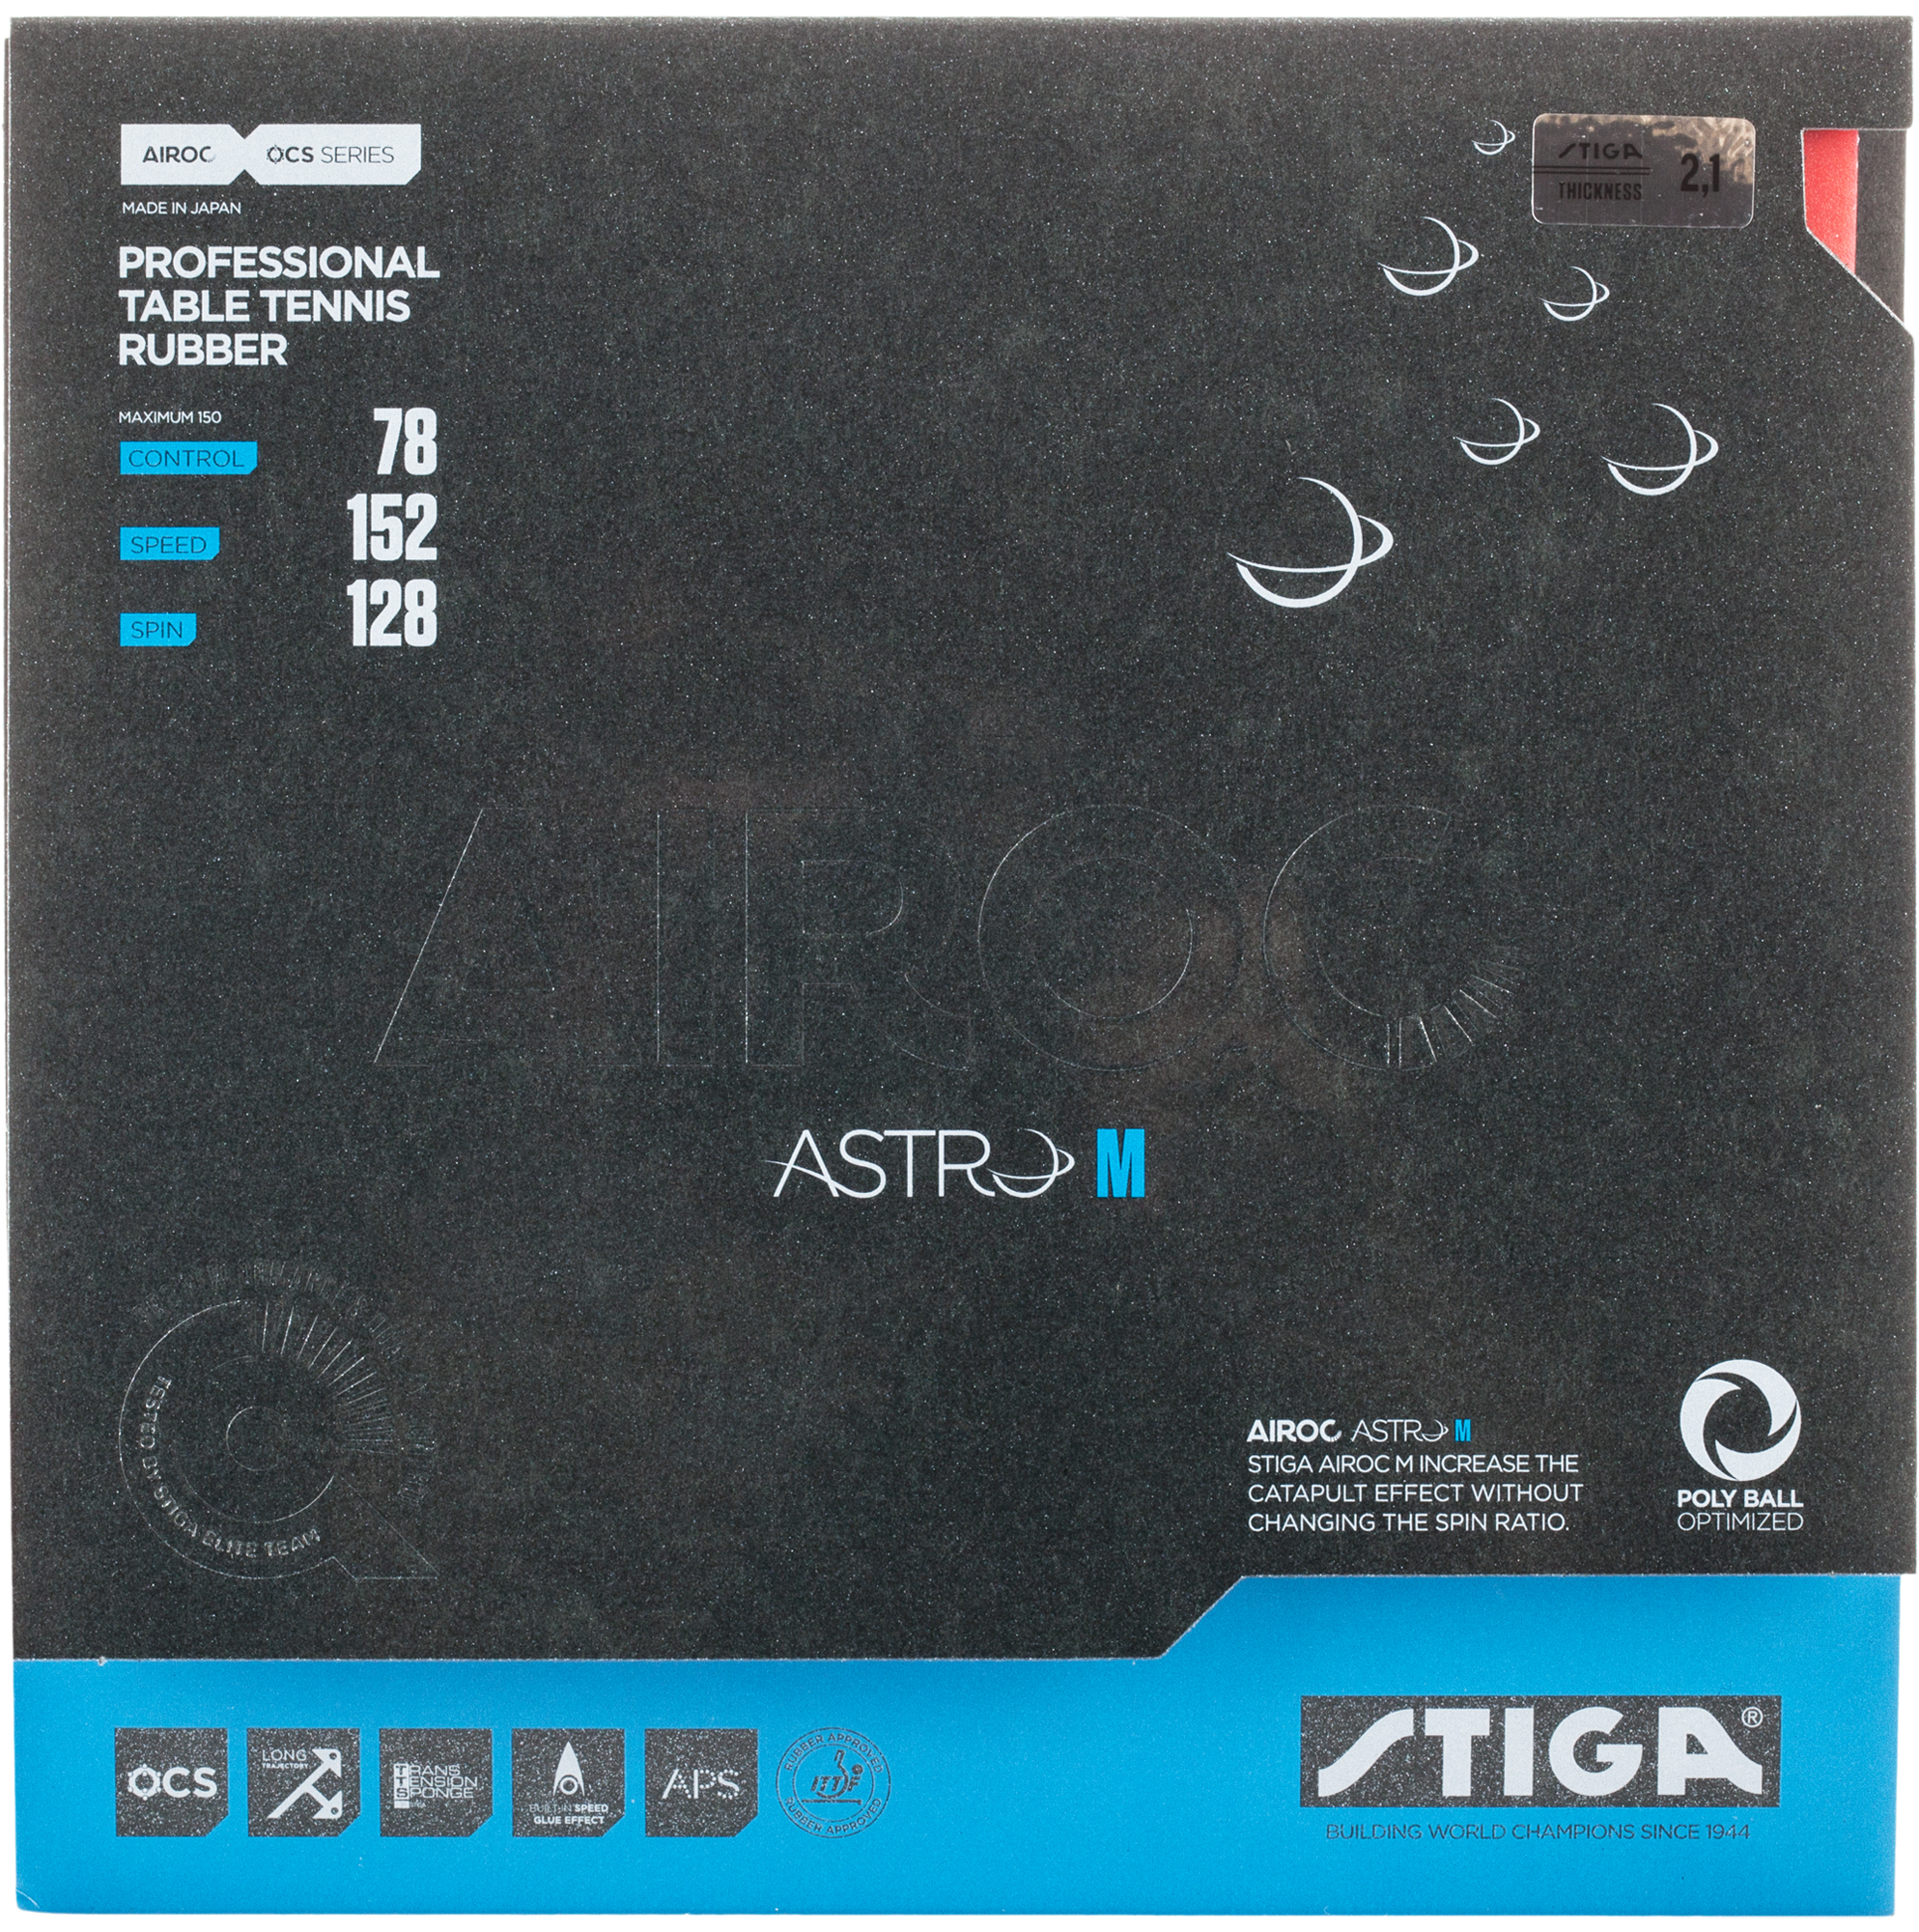 Stiga Накладка Stiga Airoc Astro M 2,1 мм цена